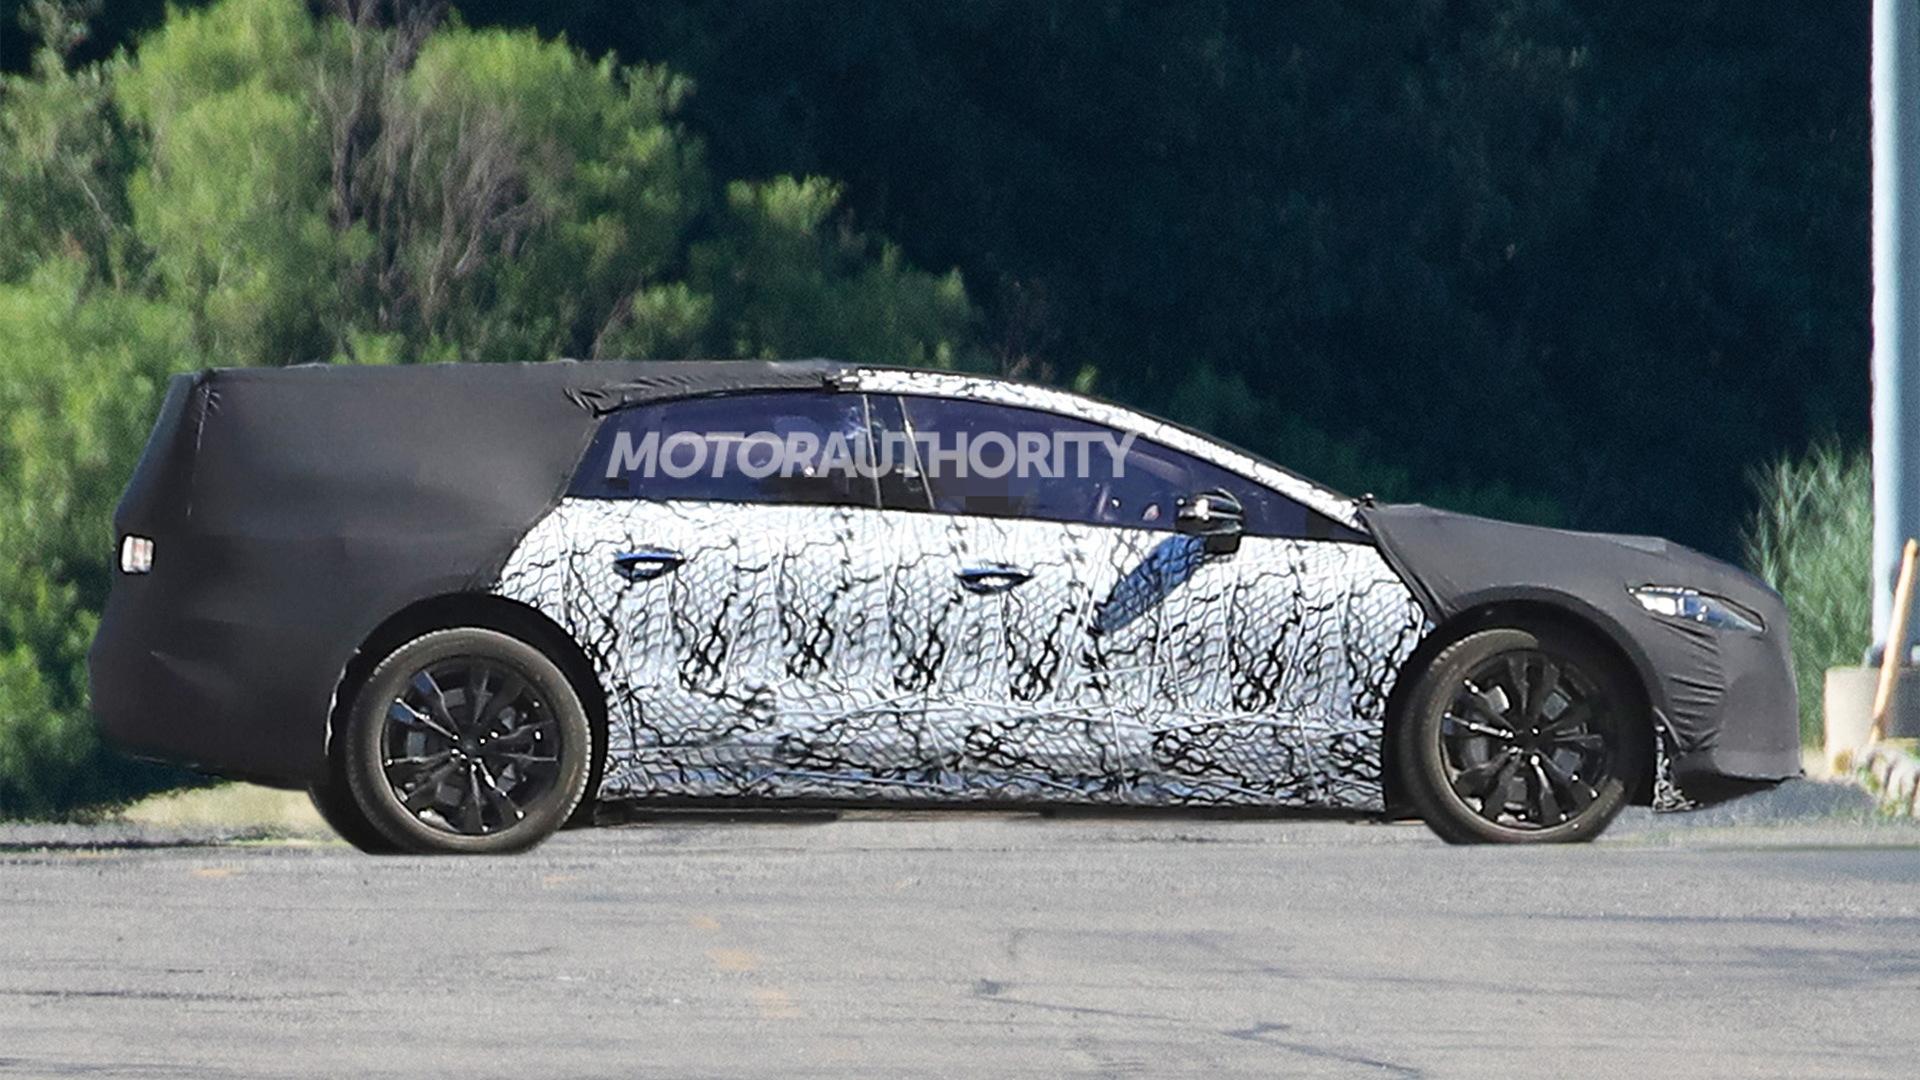 2021 Mercedes-Benz EQS spy shots - Image via S. Baldauf/SB-Medien